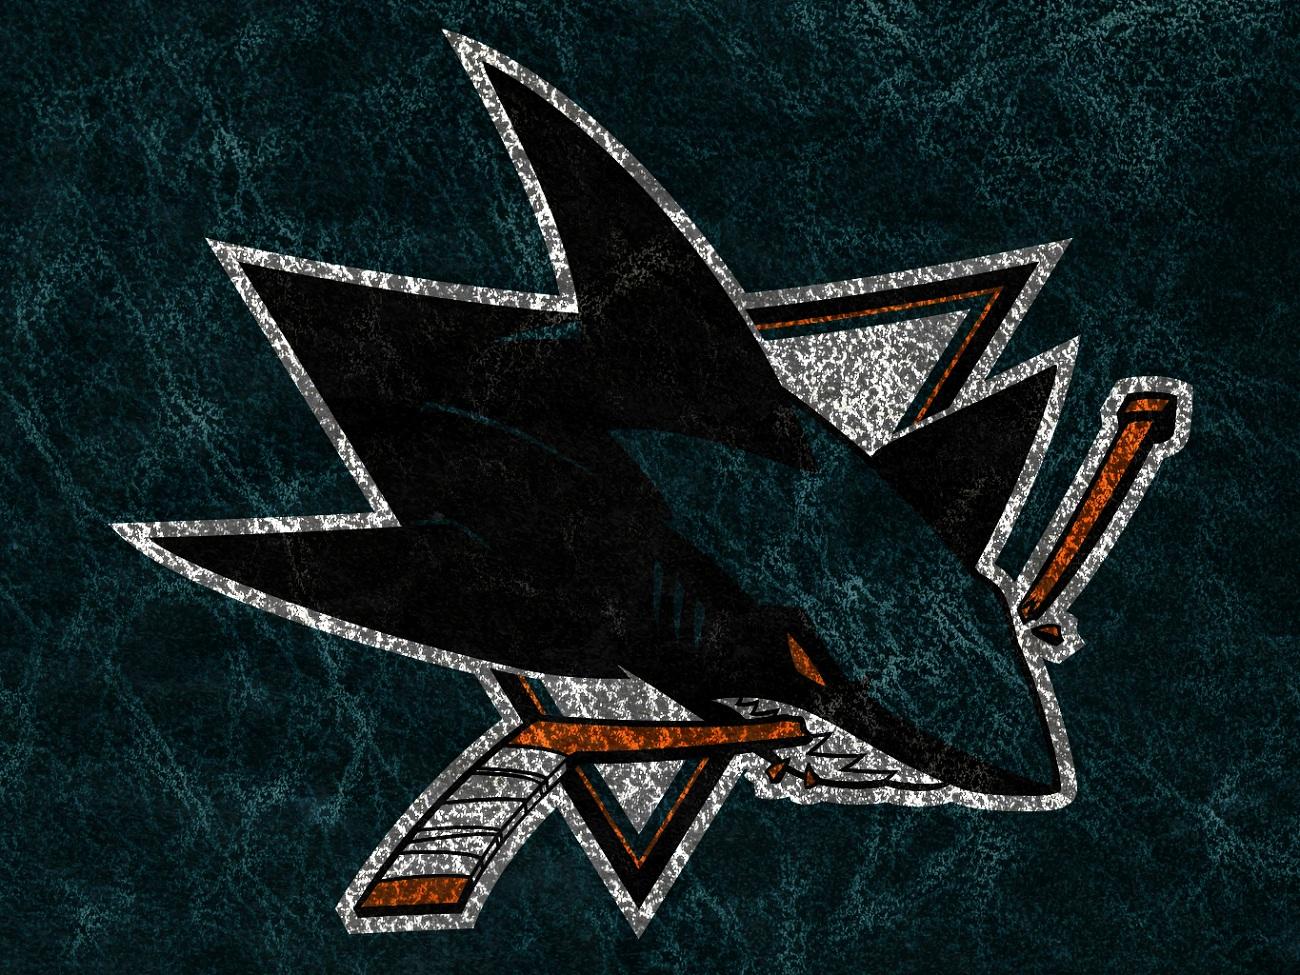 San Jose Sharks Logo Art Wallpaper 1300975 180248 HD Wallpaper Res 1300x975